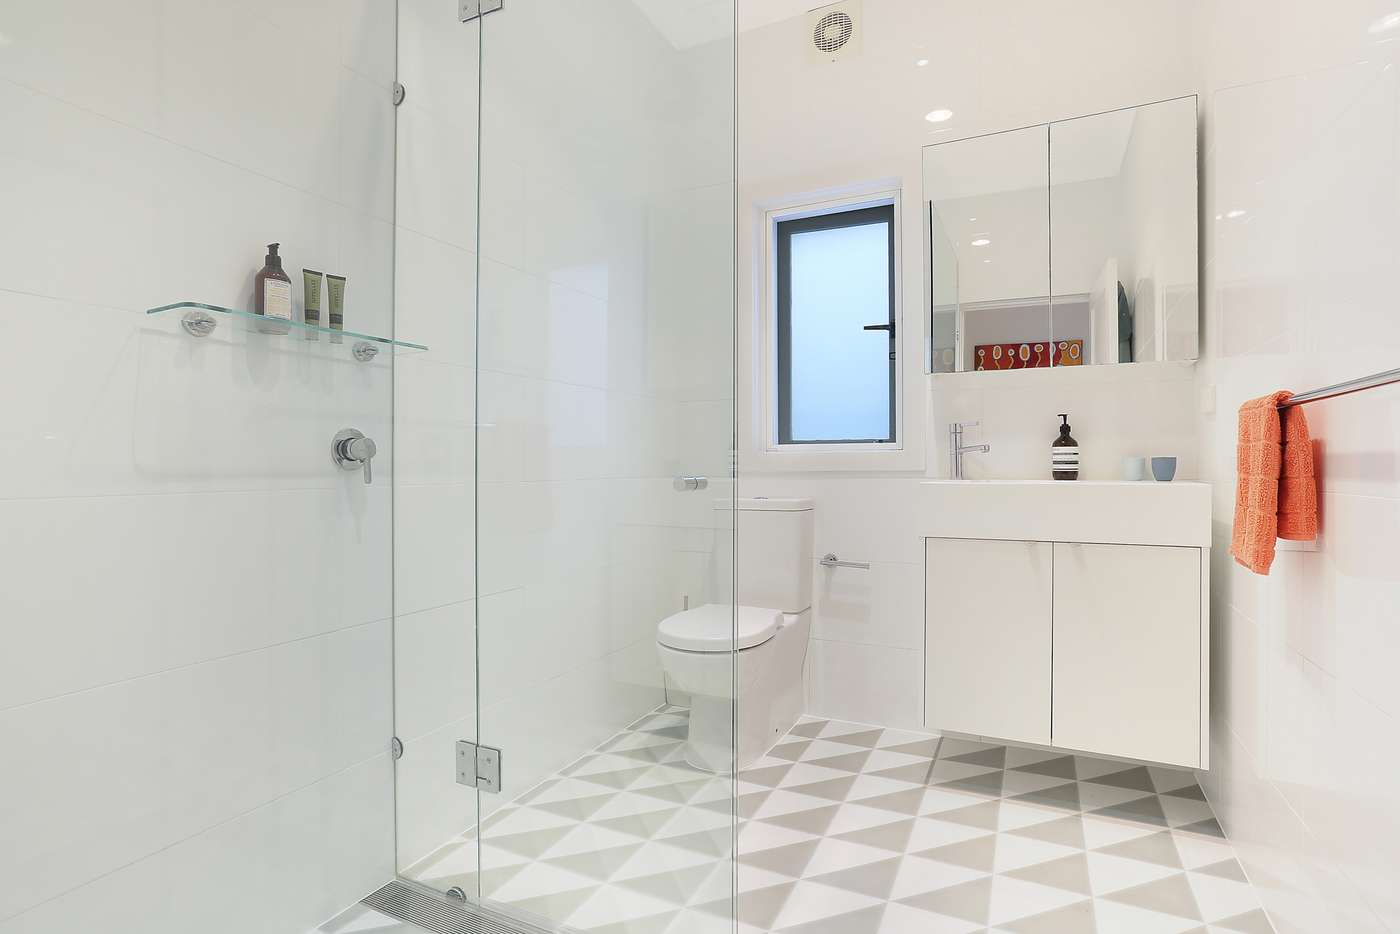 Seventh view of Homely apartment listing, 3/53 Sir Thomas Mitchell Road, Bondi Beach NSW 2026